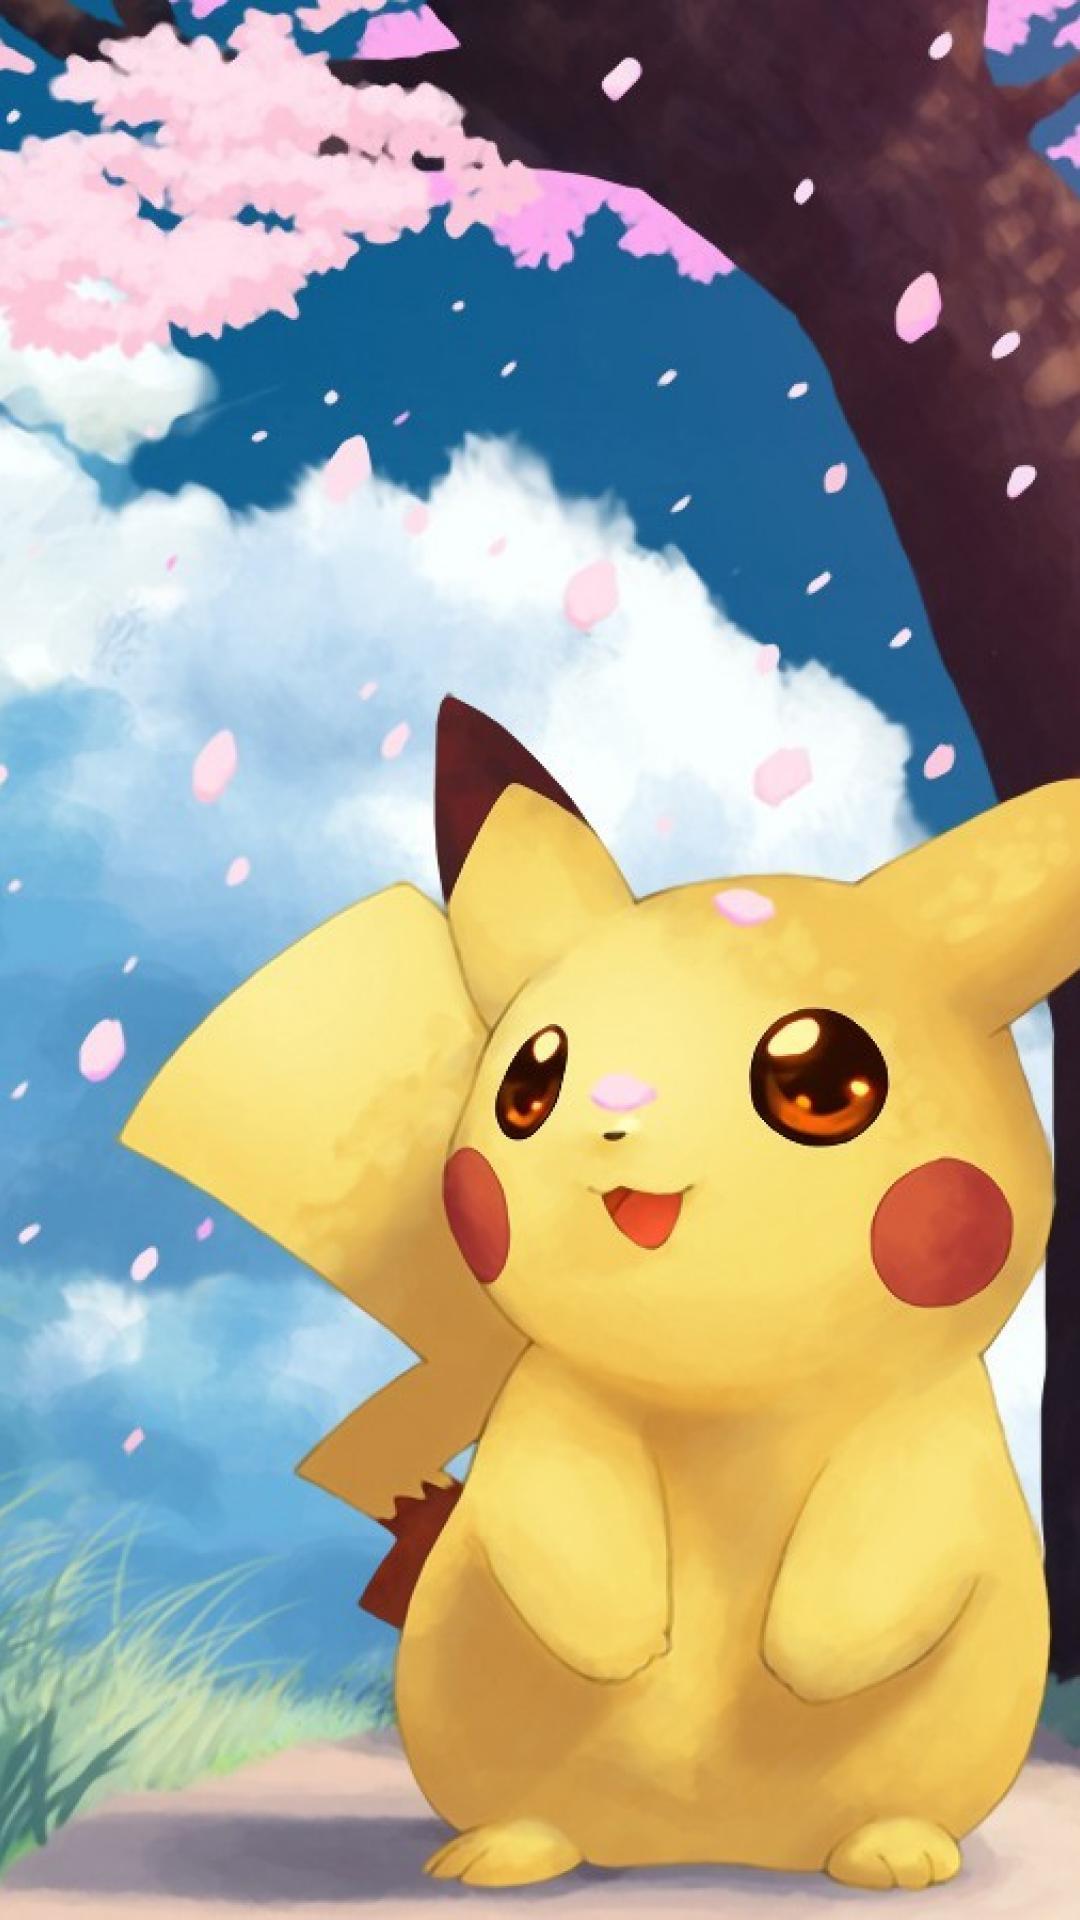 Pokemon Iphone Wallpaper Cute Pikachu Wallpaper For Mobile